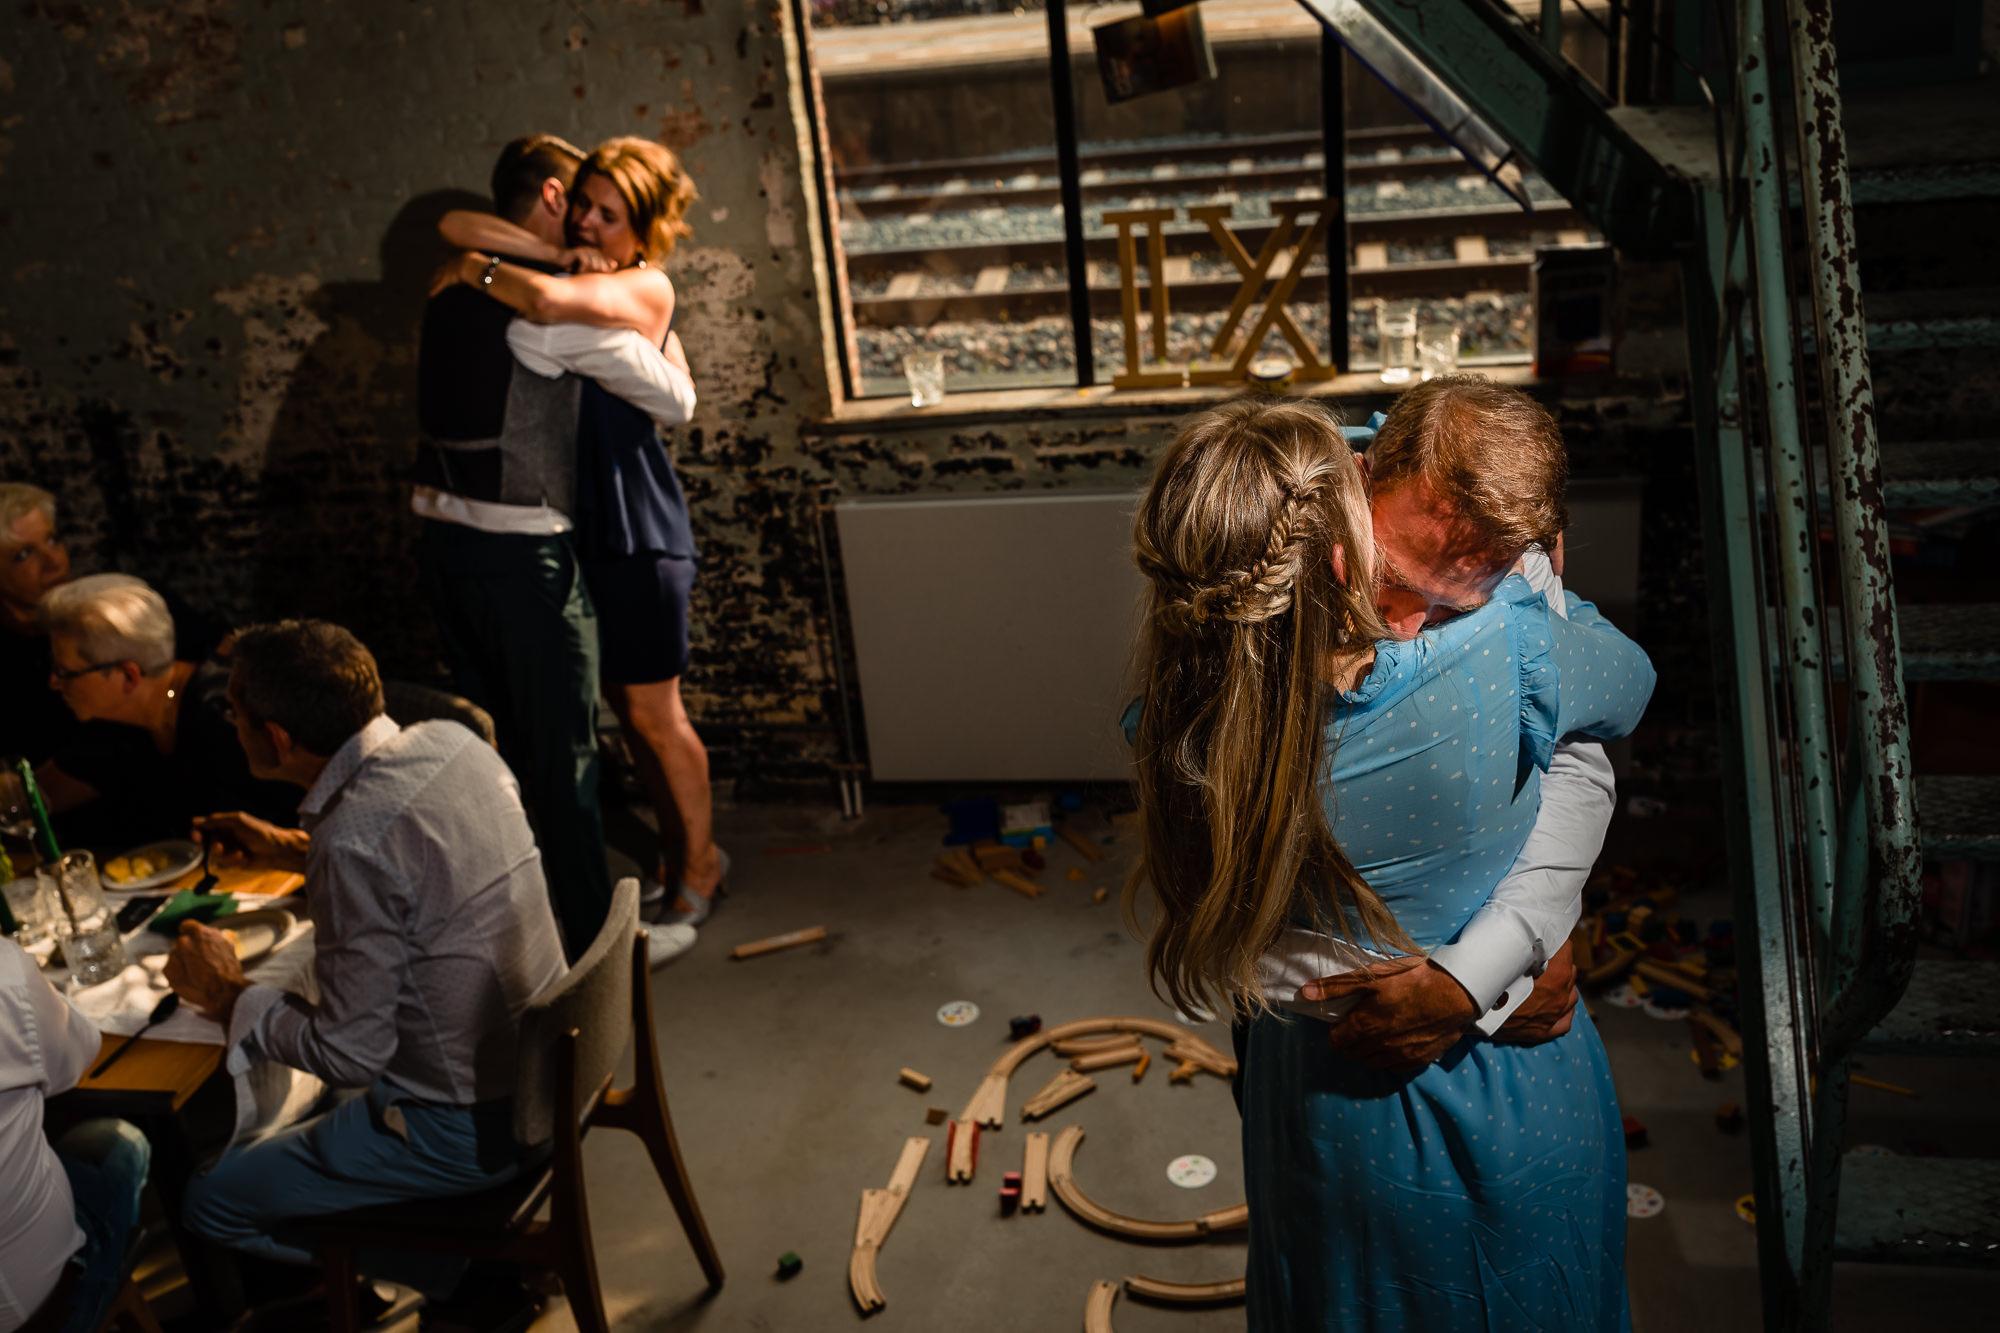 Bruidegoms knuffelen beiden tegelijk hun vriendinnen